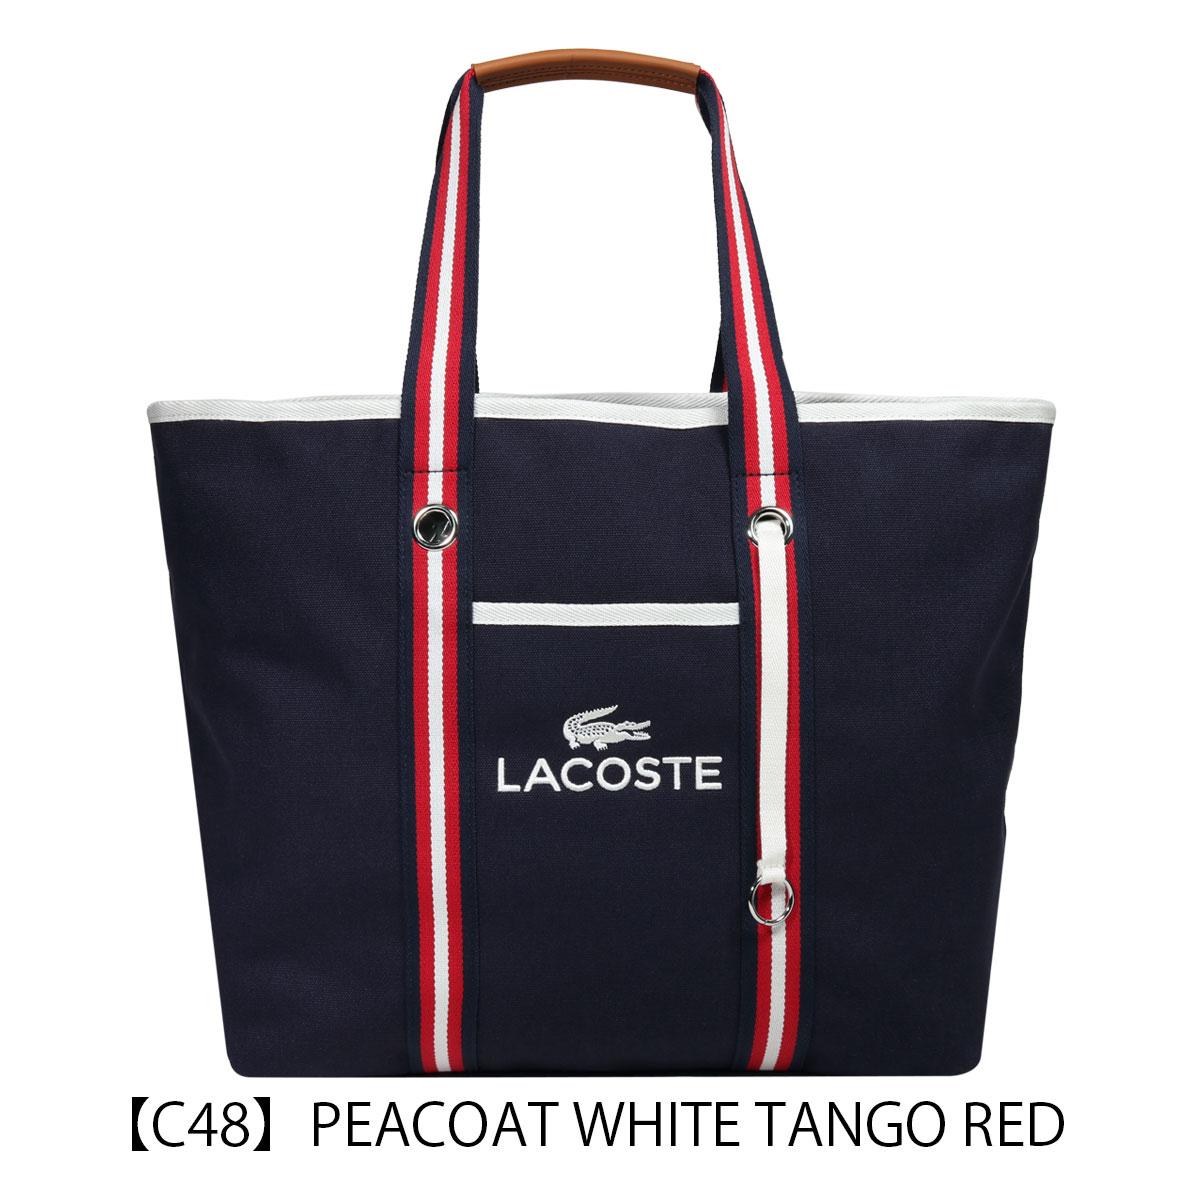 【C48】PEACOAT WHITE TANGO RED